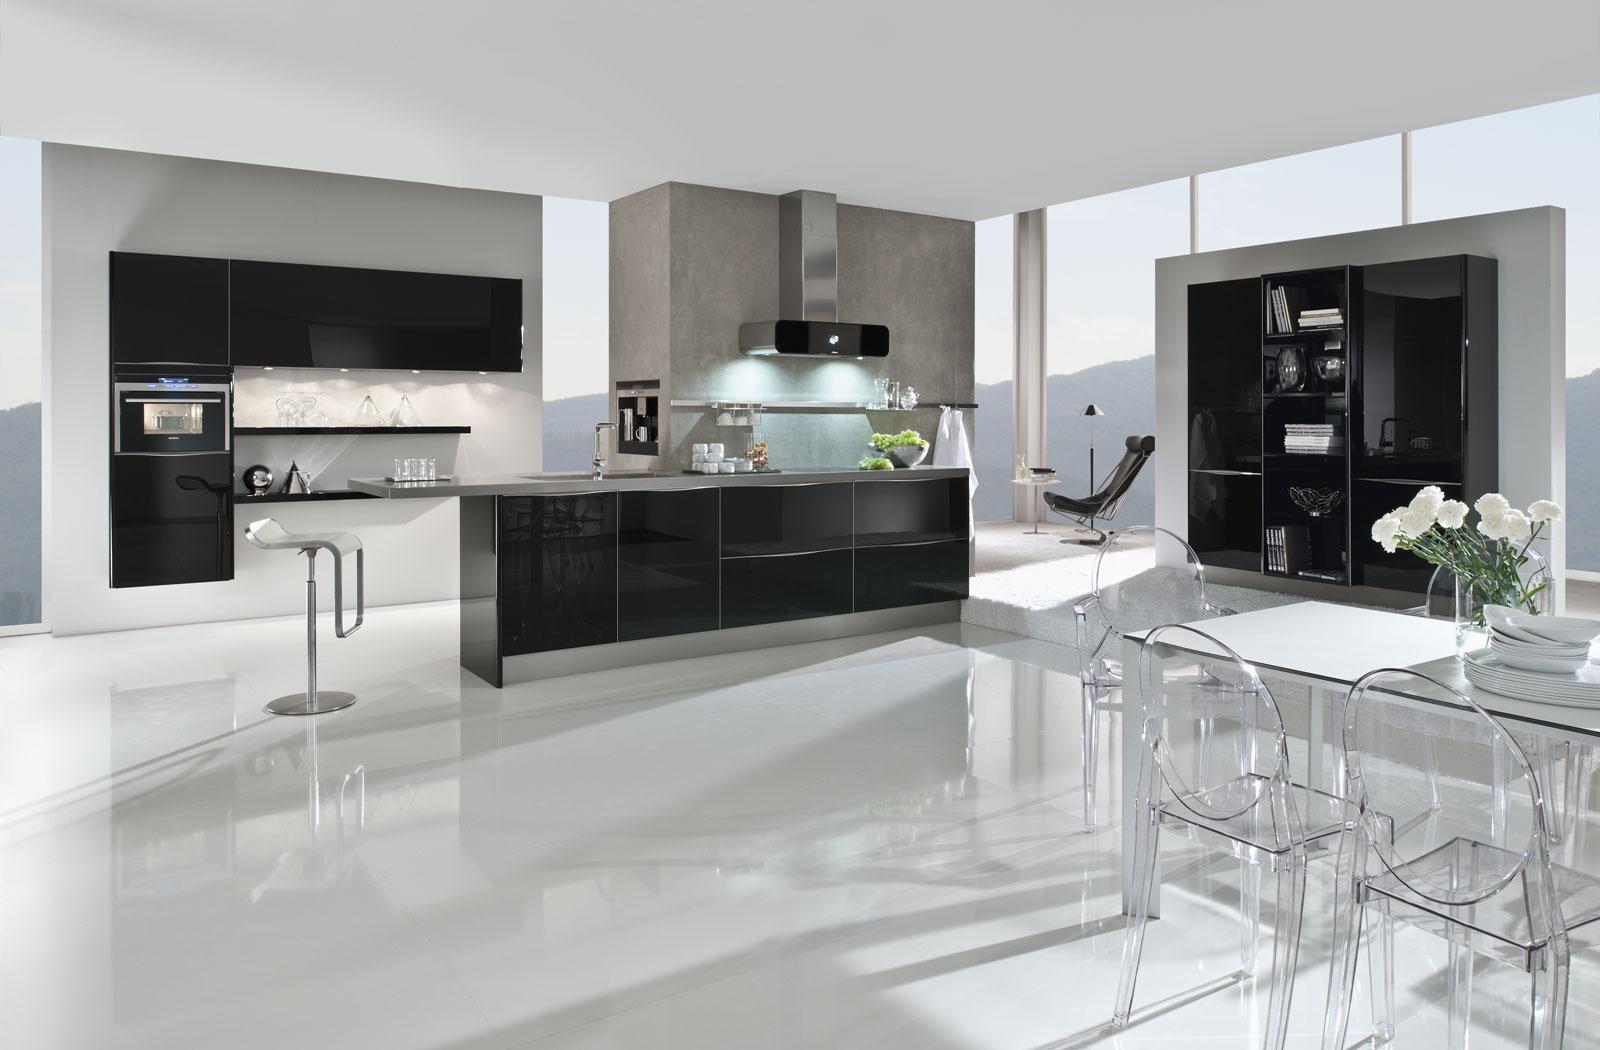 Häcker Küchen Erfahrungen: Design